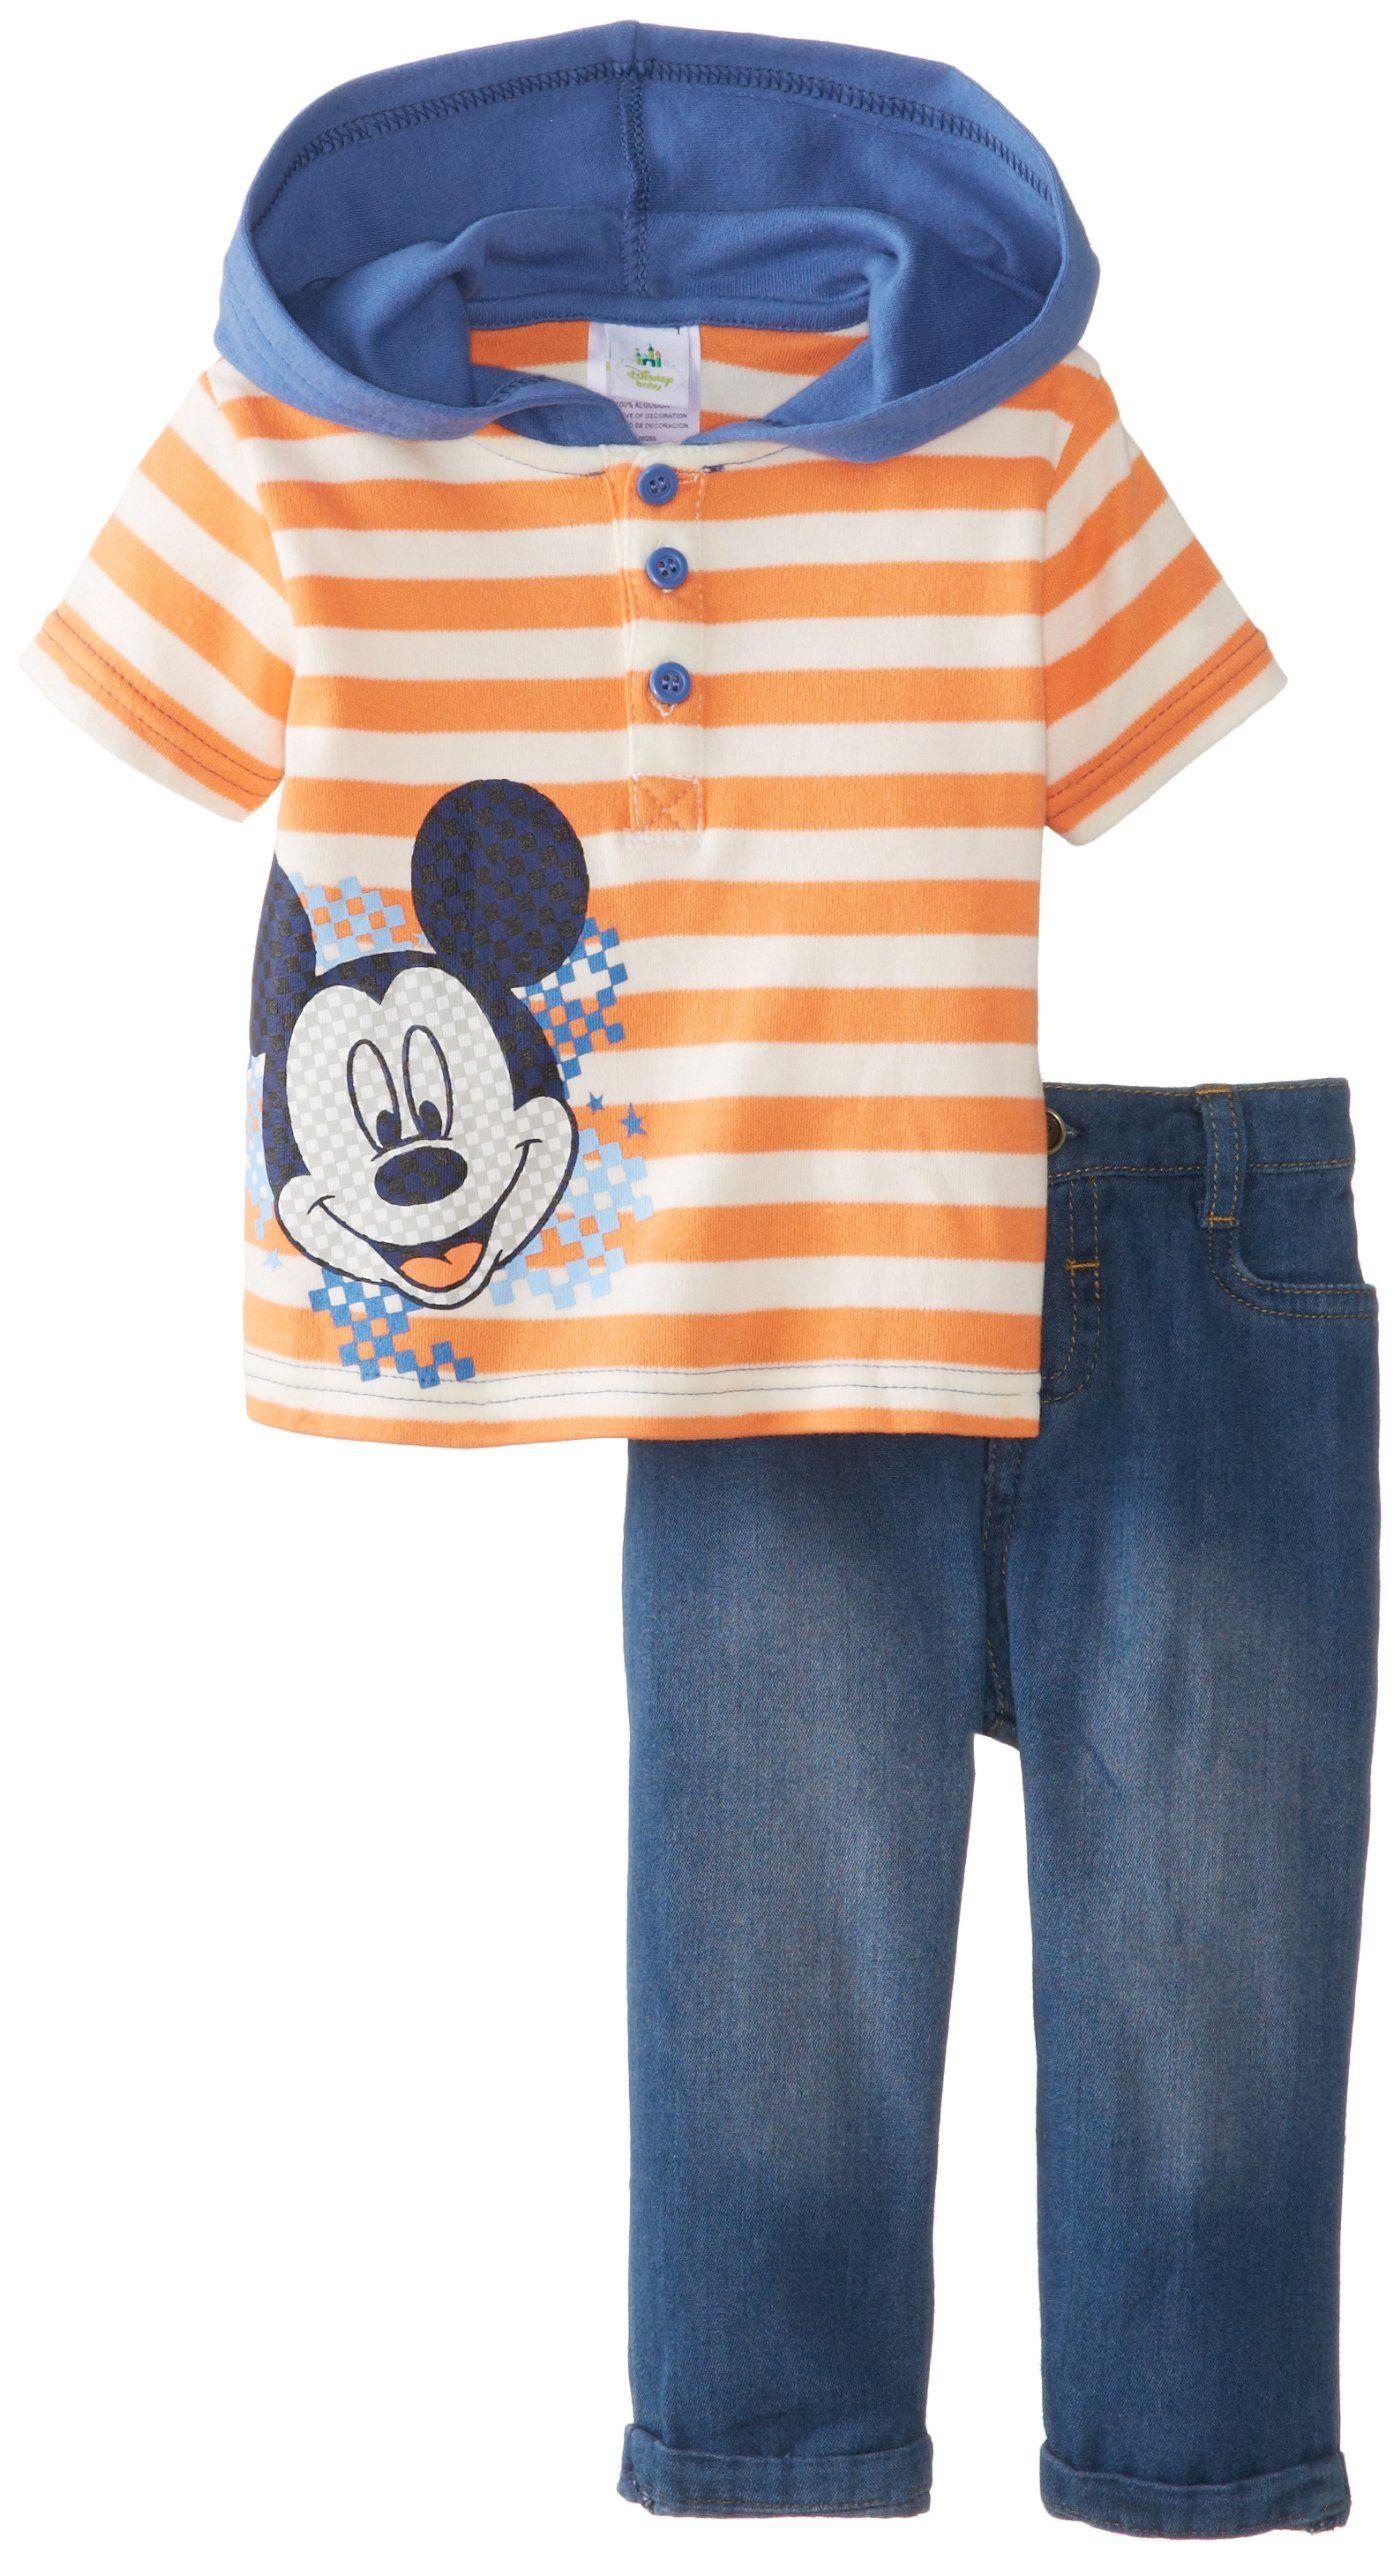 9e9b9a305 Disney Baby Baby-Boys Newborn Mickey Mouse Denim 2 Piece Pant Set,  Nectarine, 3-6 Months. #clothe